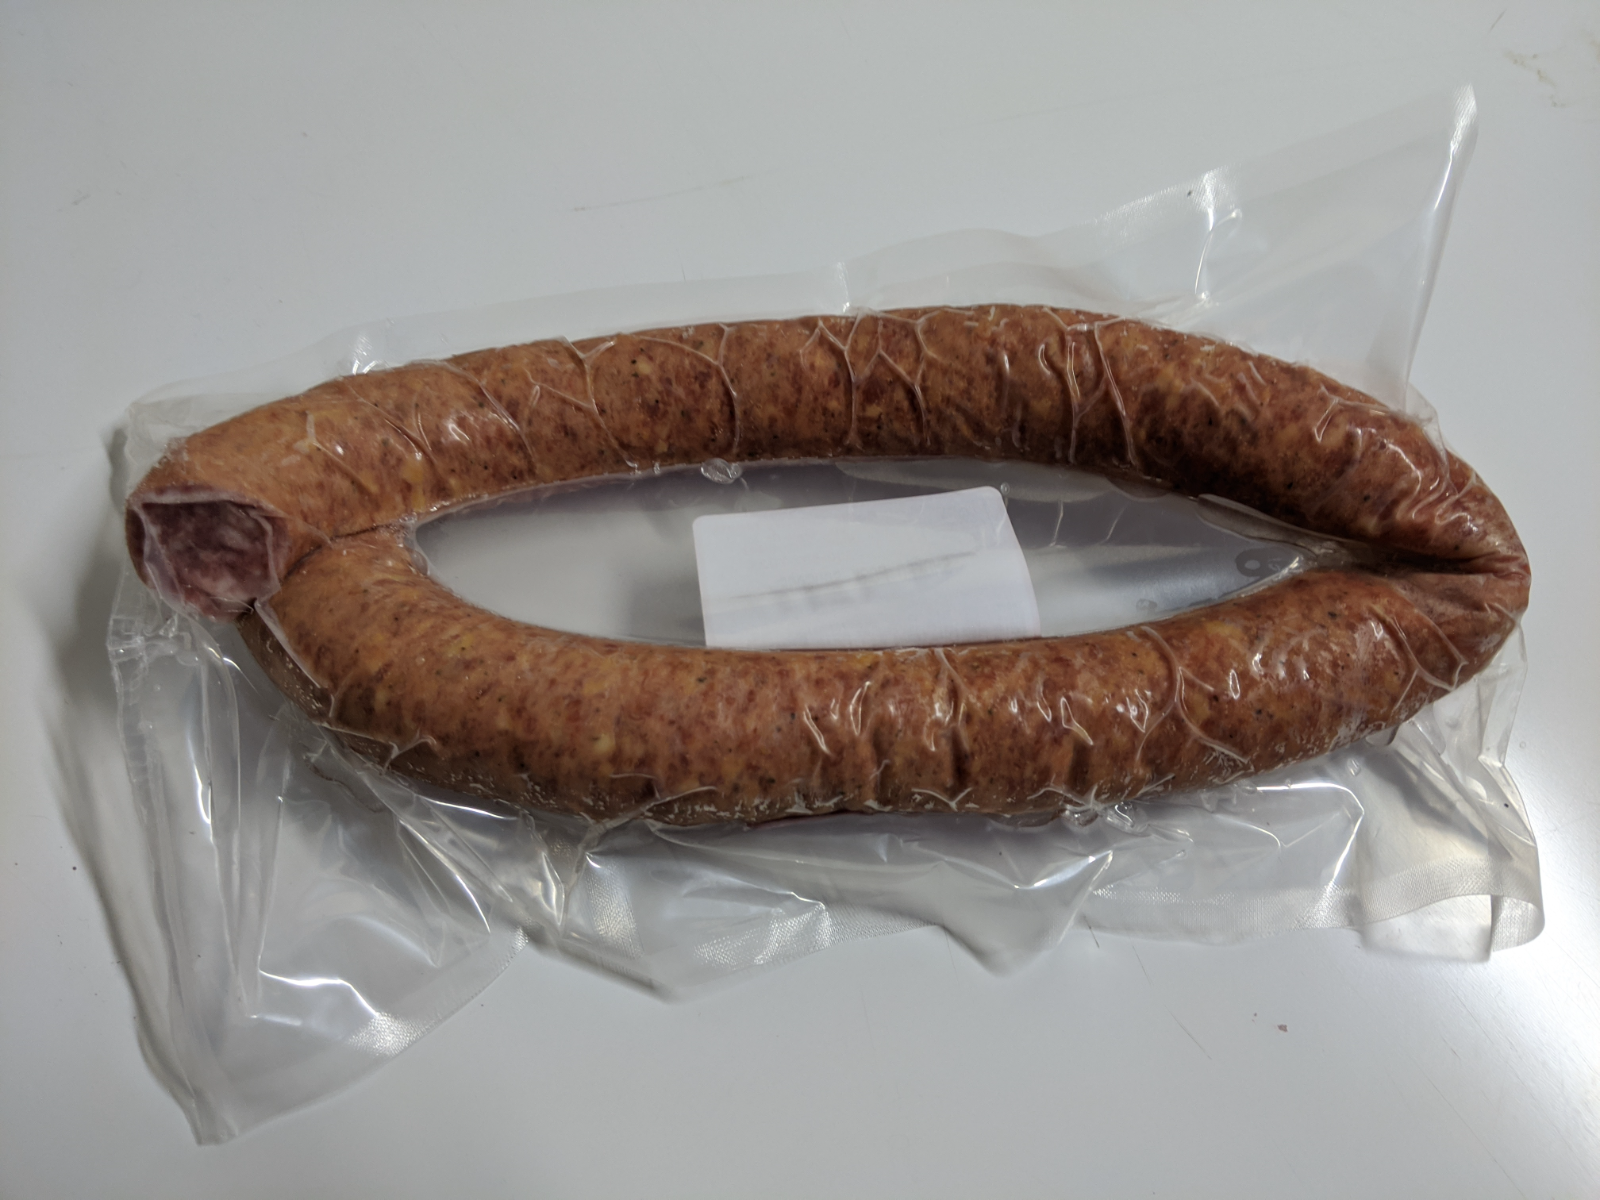 smoked-dinner-sausage-pasture-raised-and-nongmo-supplemented